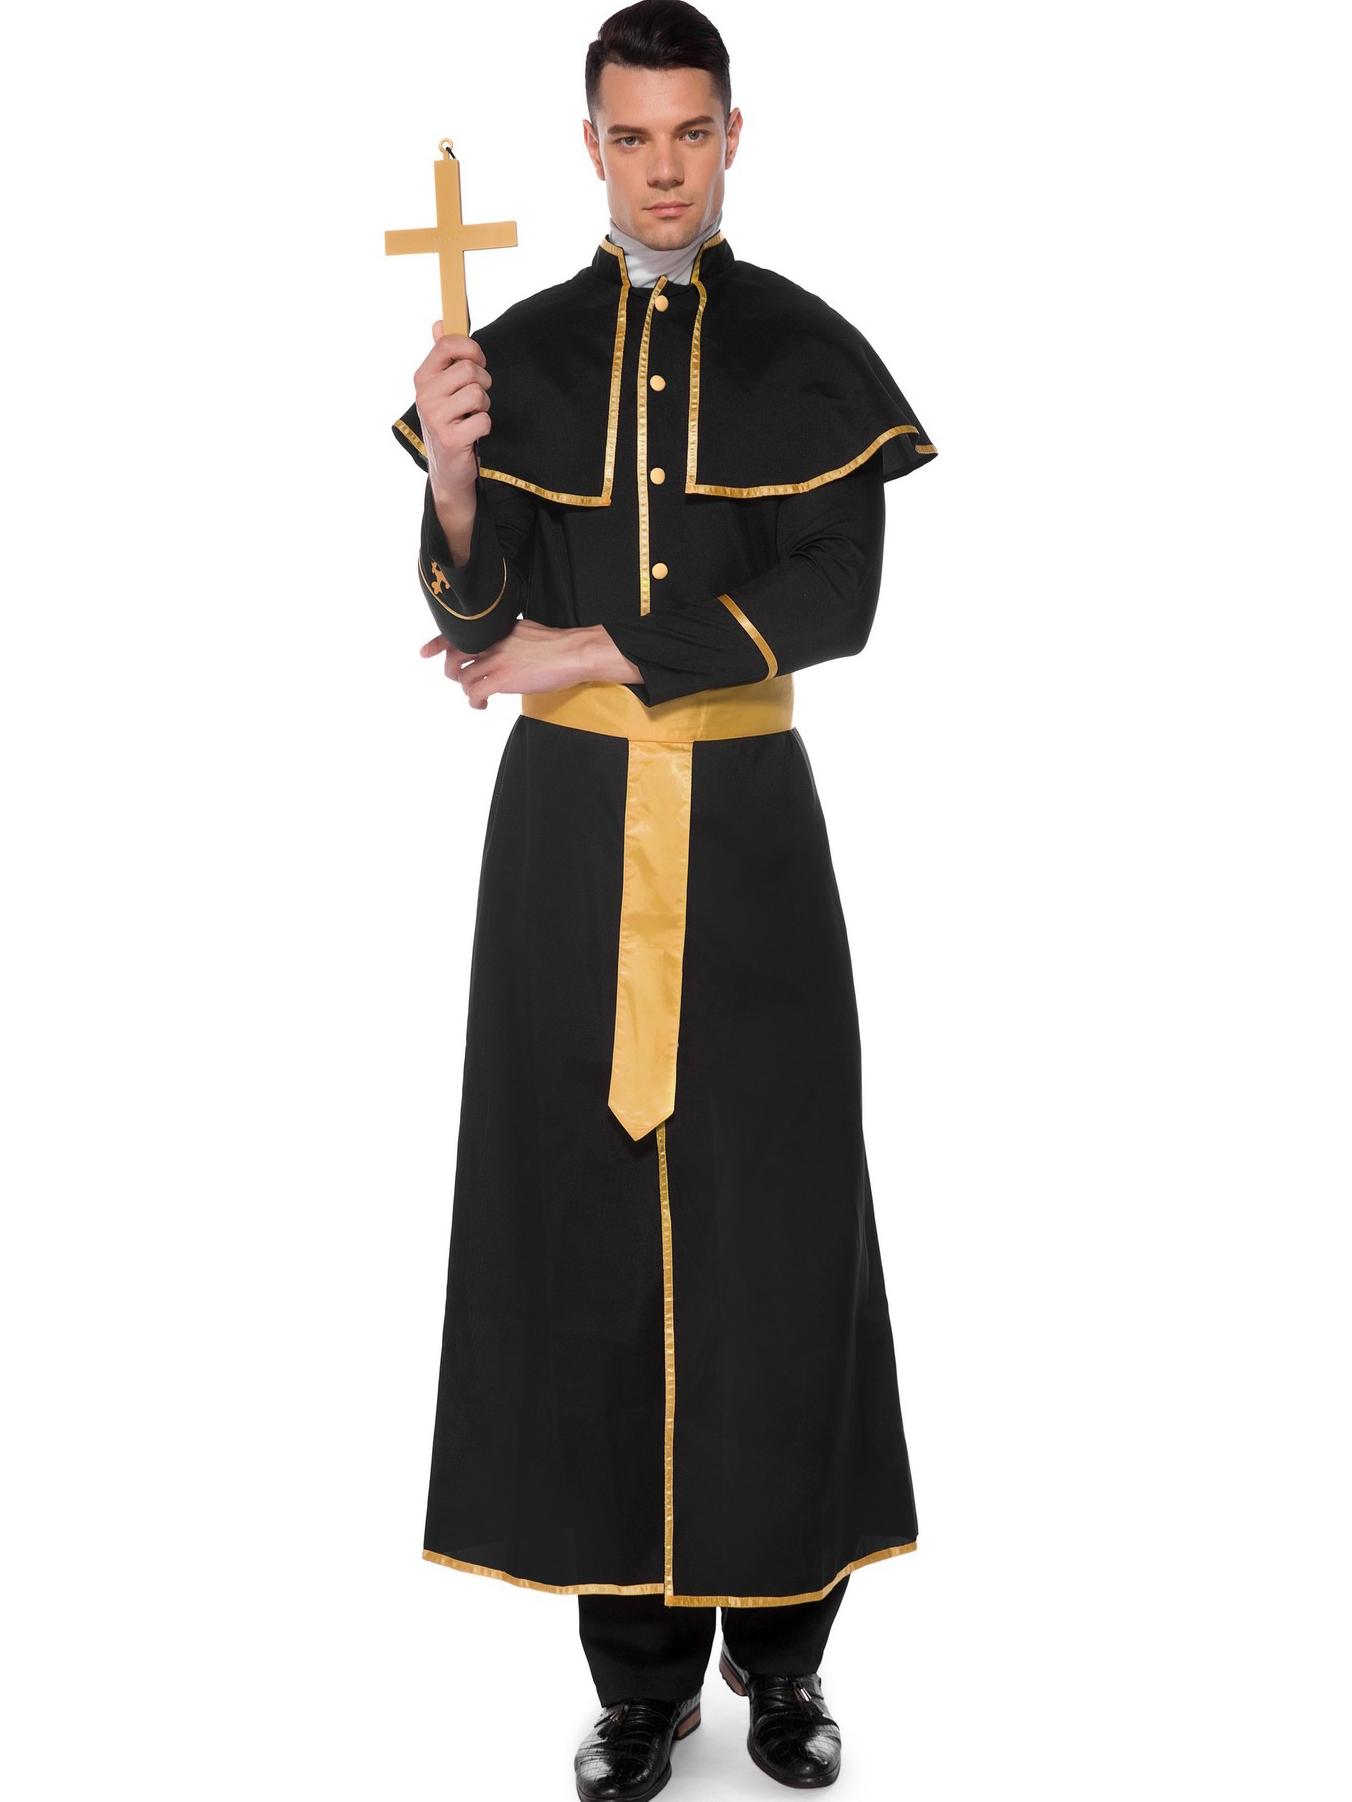 Christ Priest Black Robes Halloween Costumes For Men